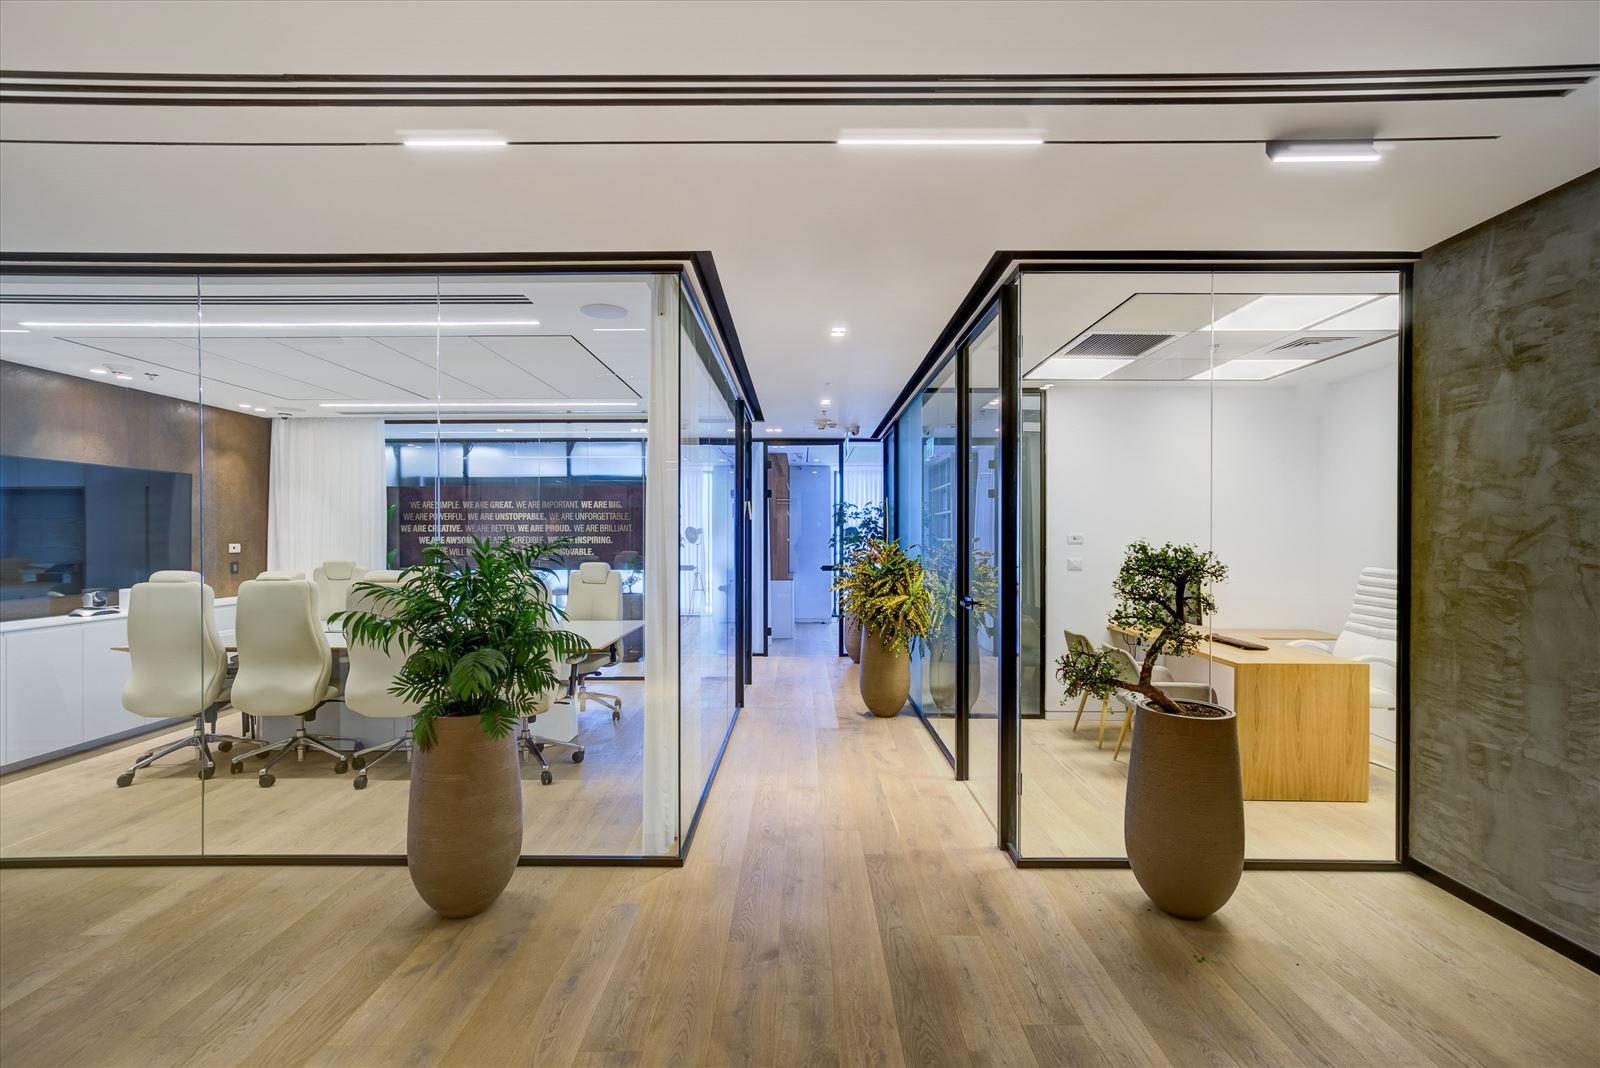 Pi Technology Office - פרויקט תאורה מבית דורי קמחי